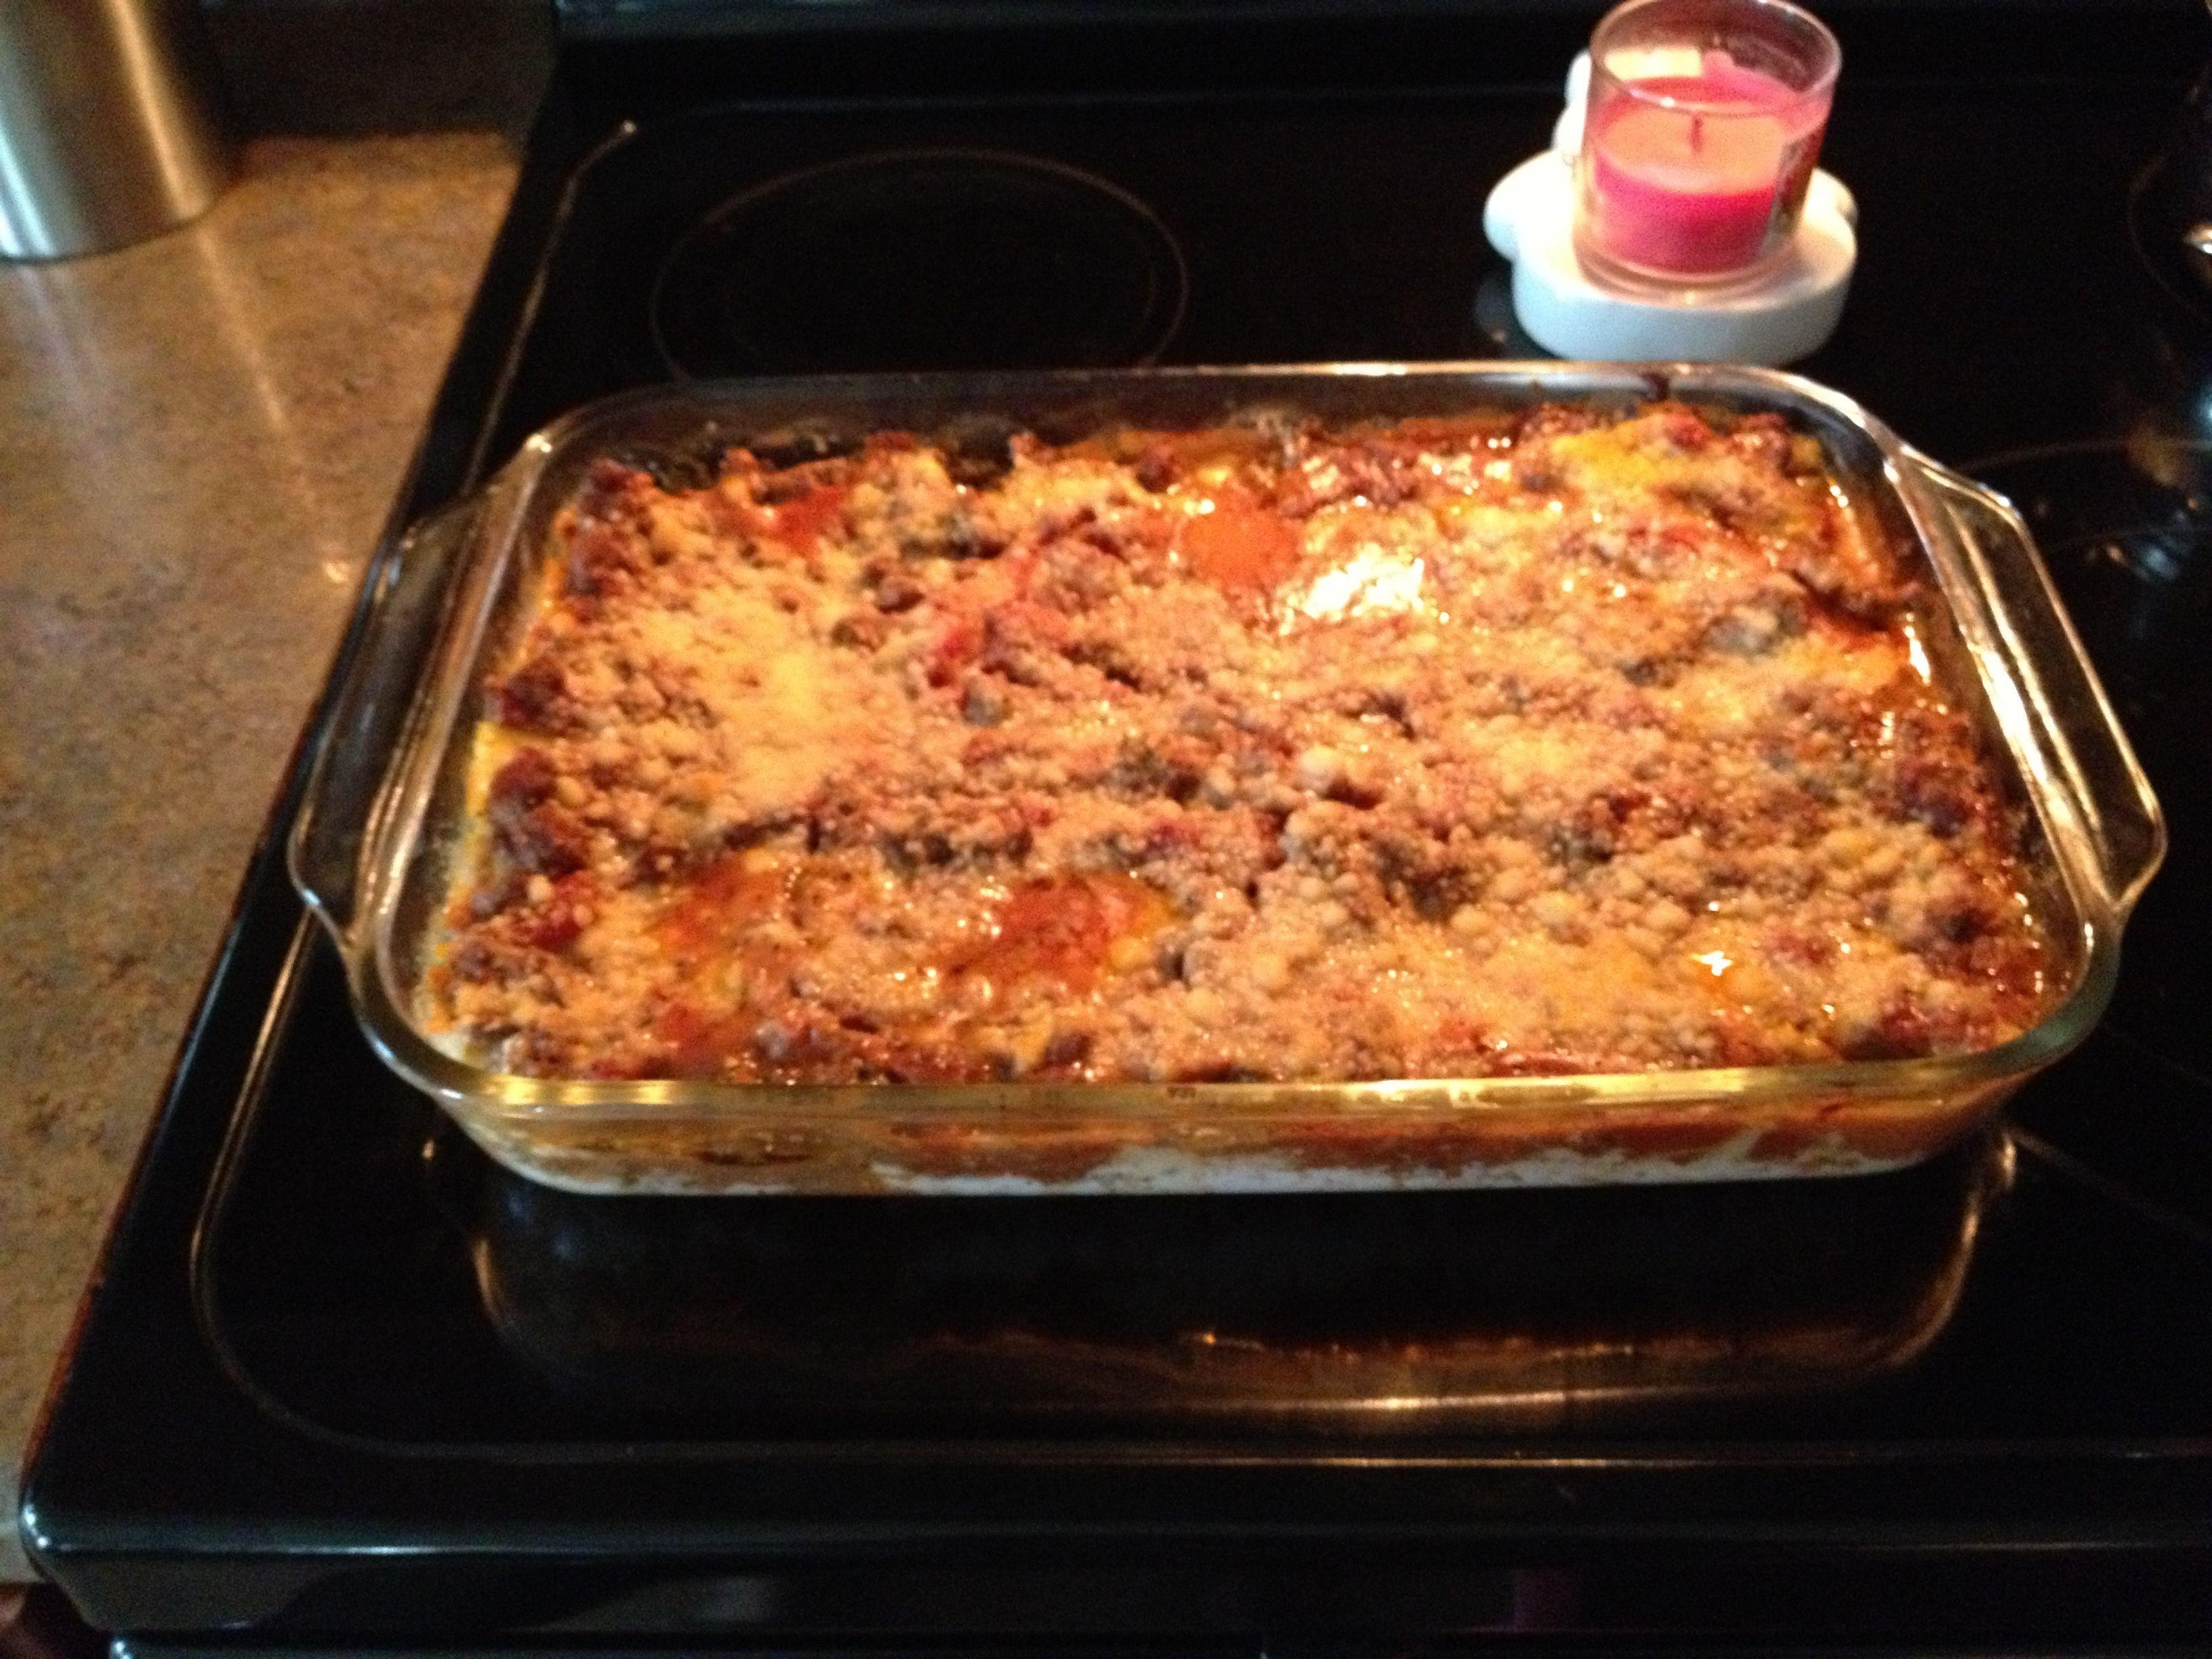 Attractive Grandmamau0027s Lasagne   Browned Seasoned Ground Meat, Ragu Garden Chunky Spaghetti  Sauce, Oven Ready